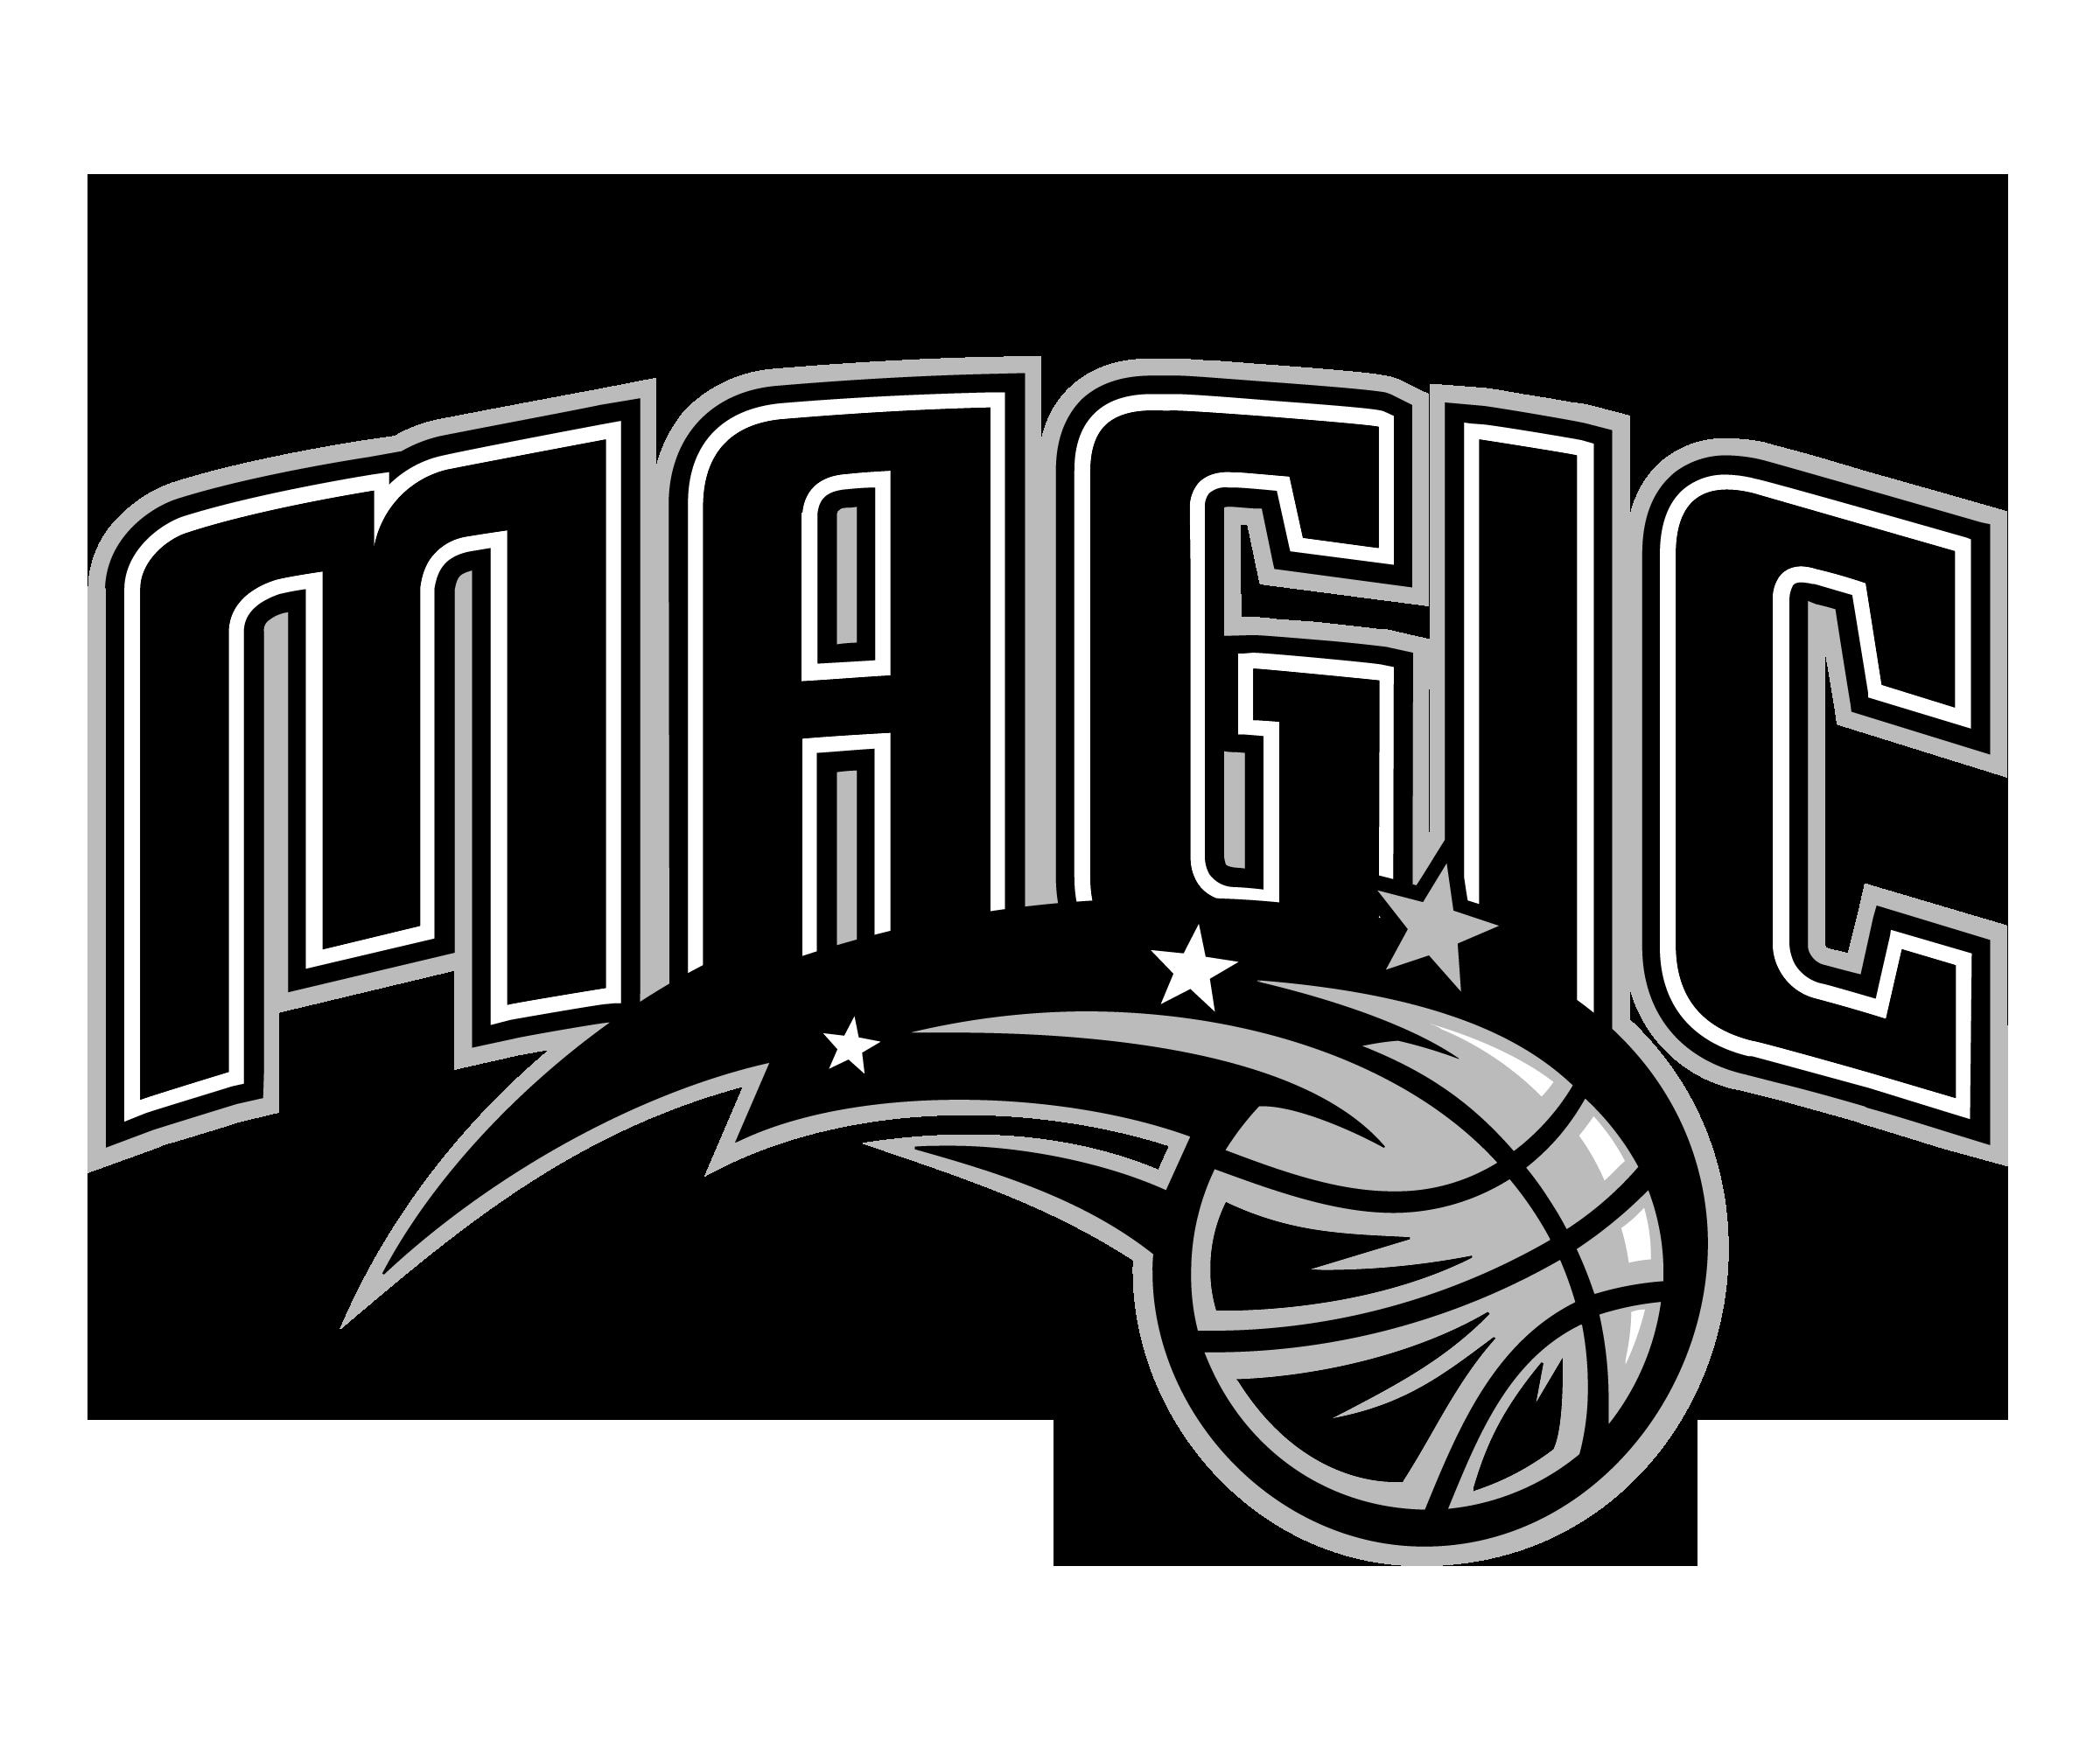 Orlando Magic Logo Png (+).